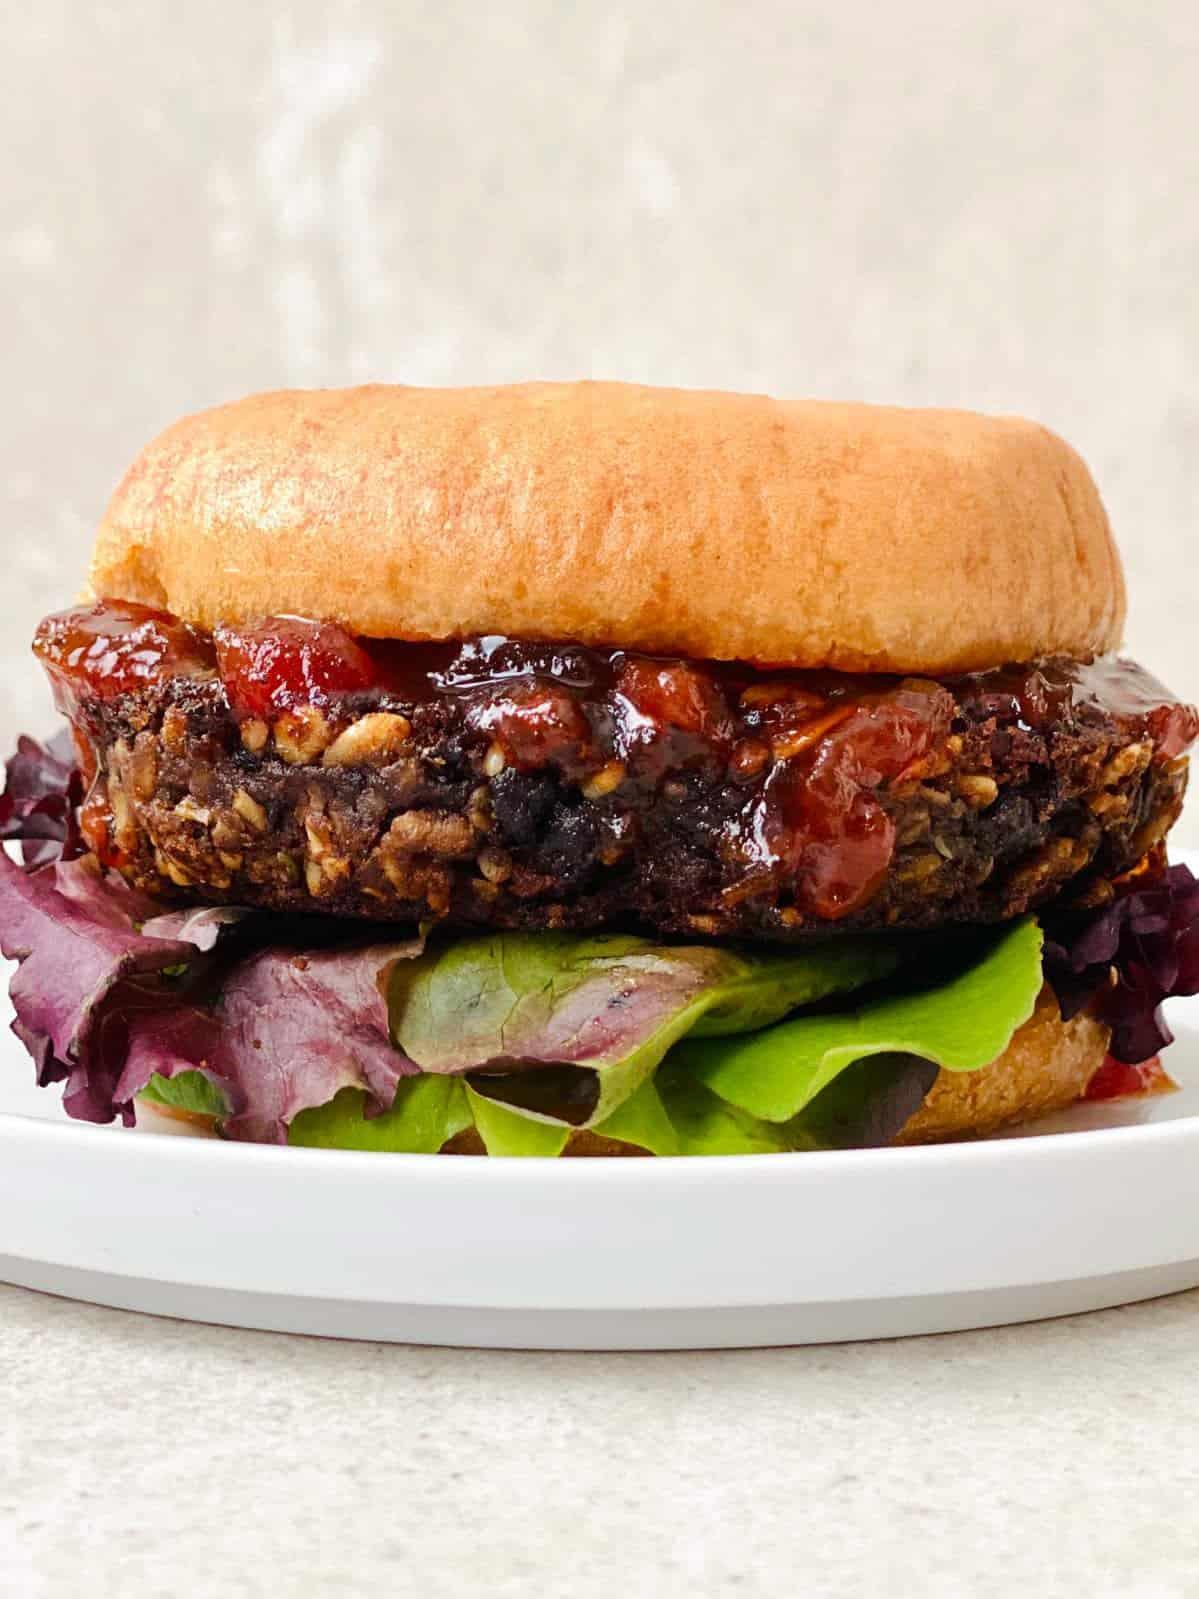 Vegan Gluten free Black Beans Burger with Tomato Jam